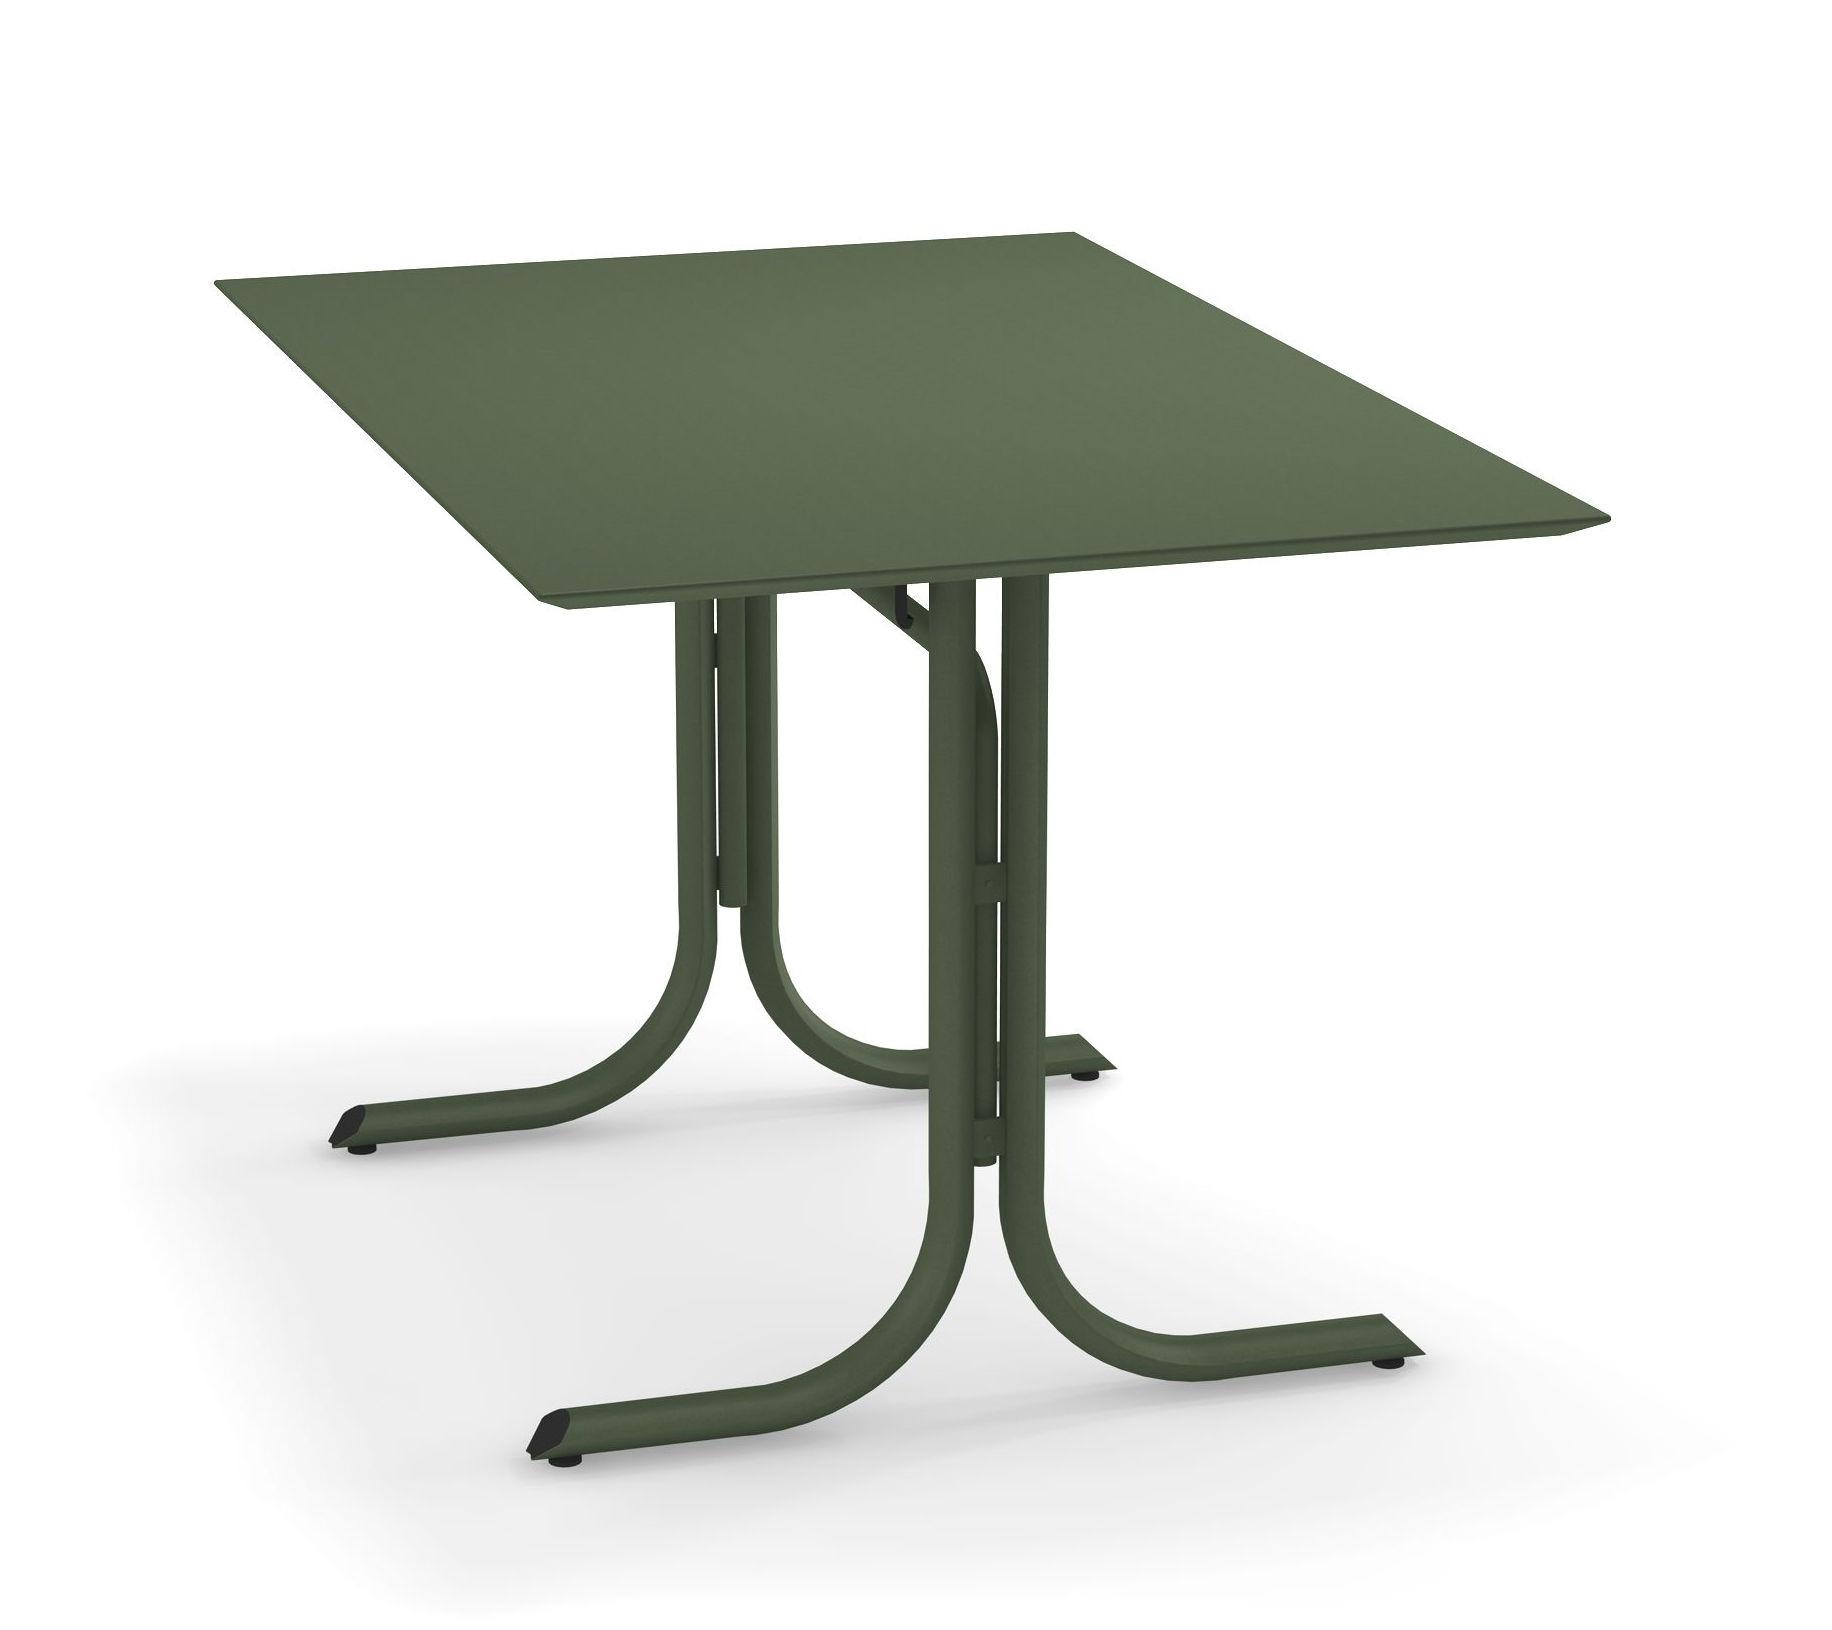 Outdoor - Tavoli  - Tavolo pieghevole System - / 80 x 120 cm di Emu - Verde militare - Acier peint galvanisé